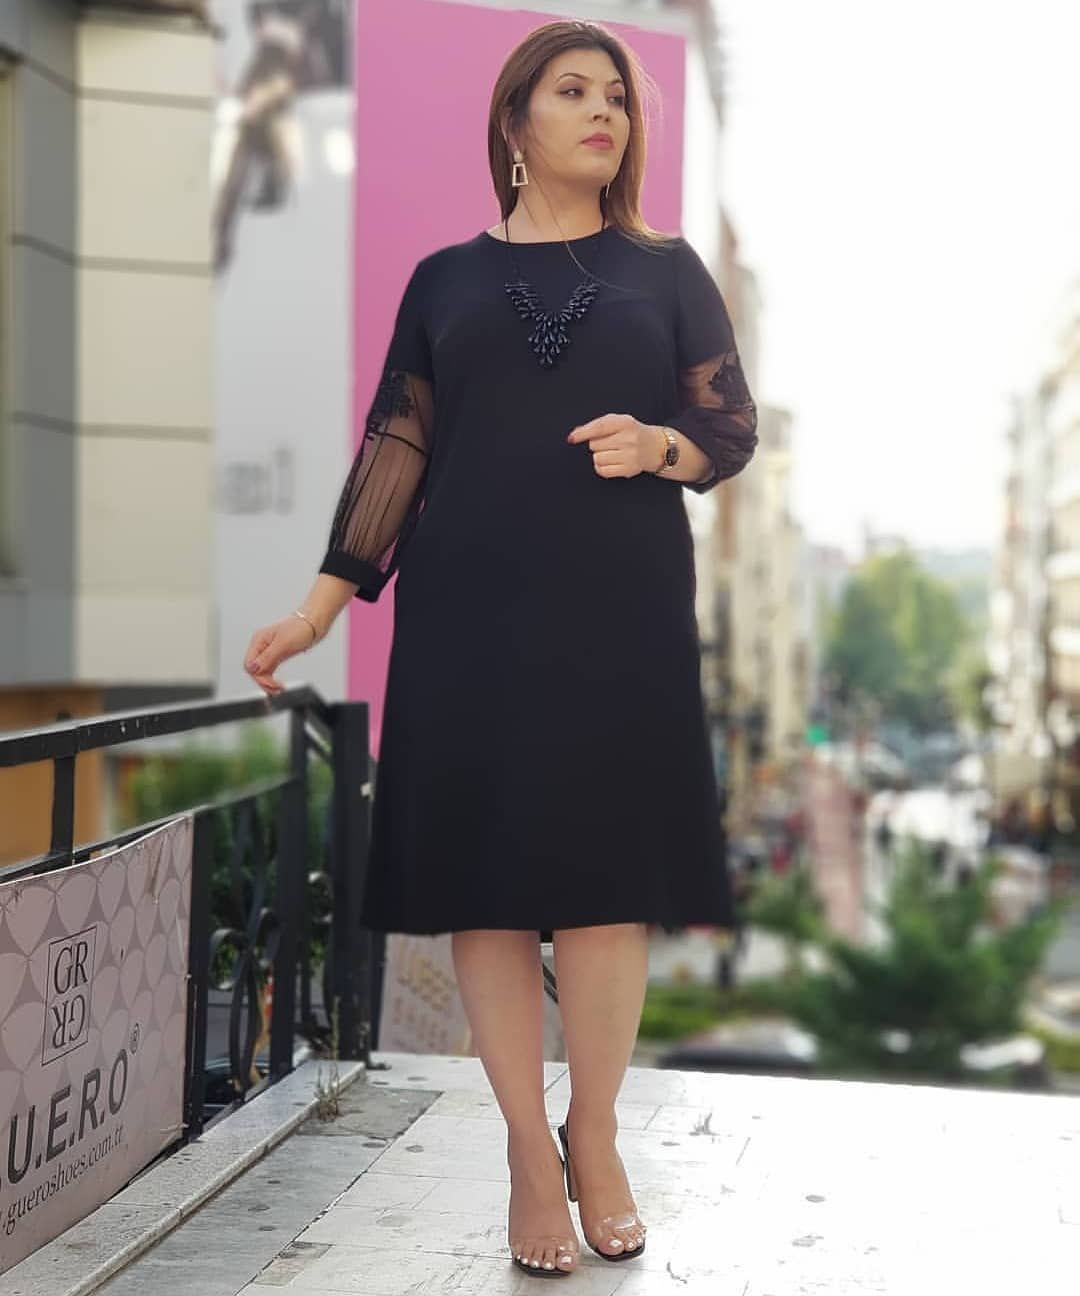 Yeni Kolleksiya Merbi Boutique Followforfollowback Instagram Instalike Dresses Shoulder Dress Cold Shoulder Dress